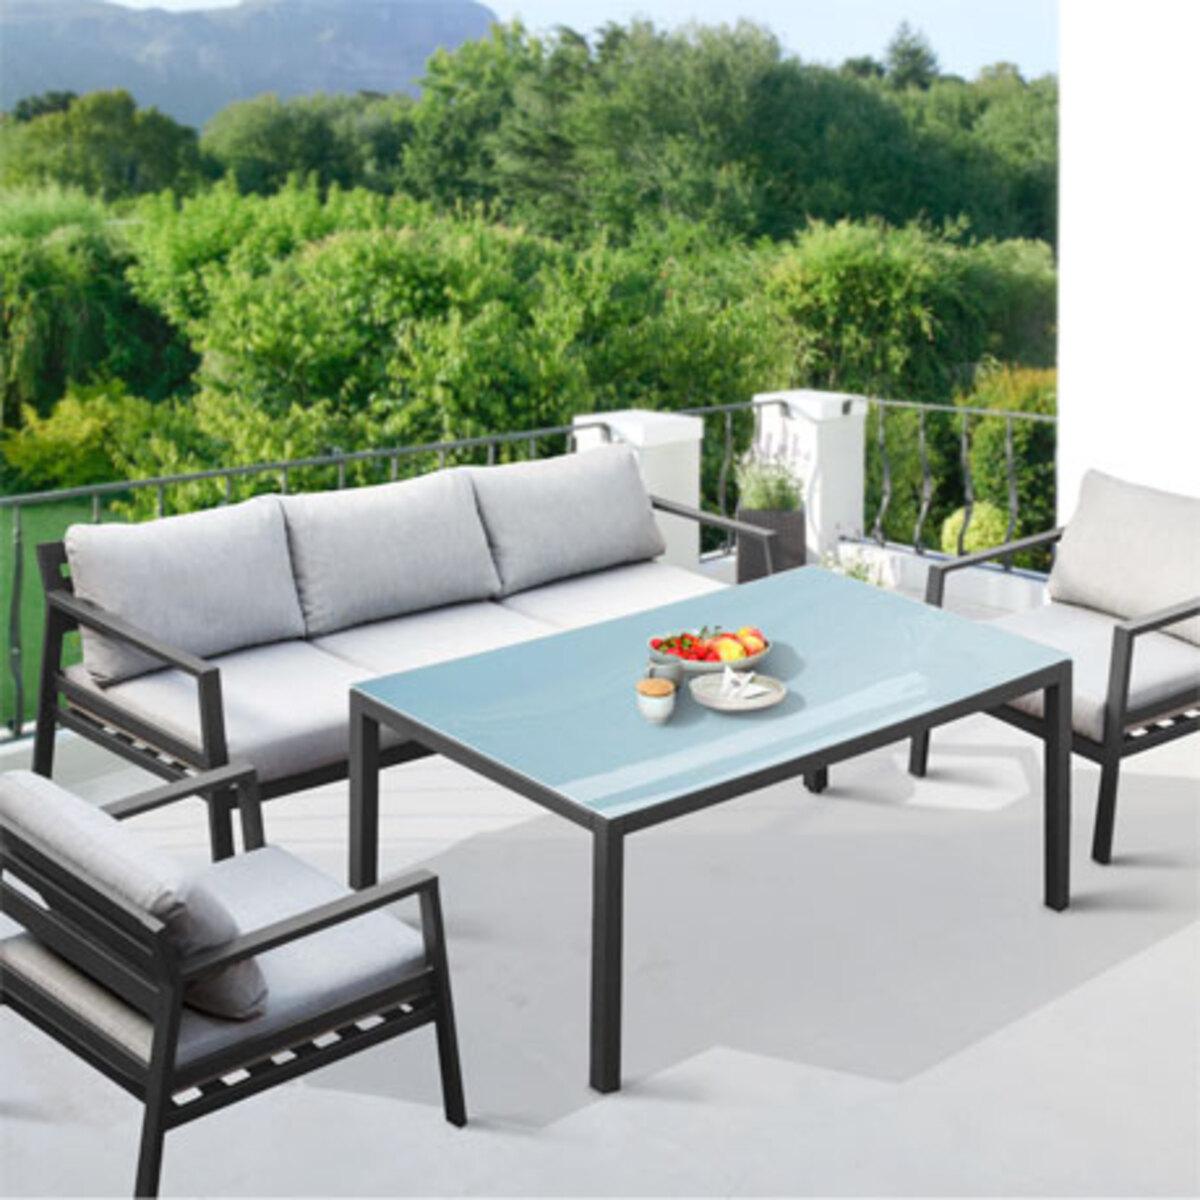 Bild 1 von Aluminium-Garten-Set